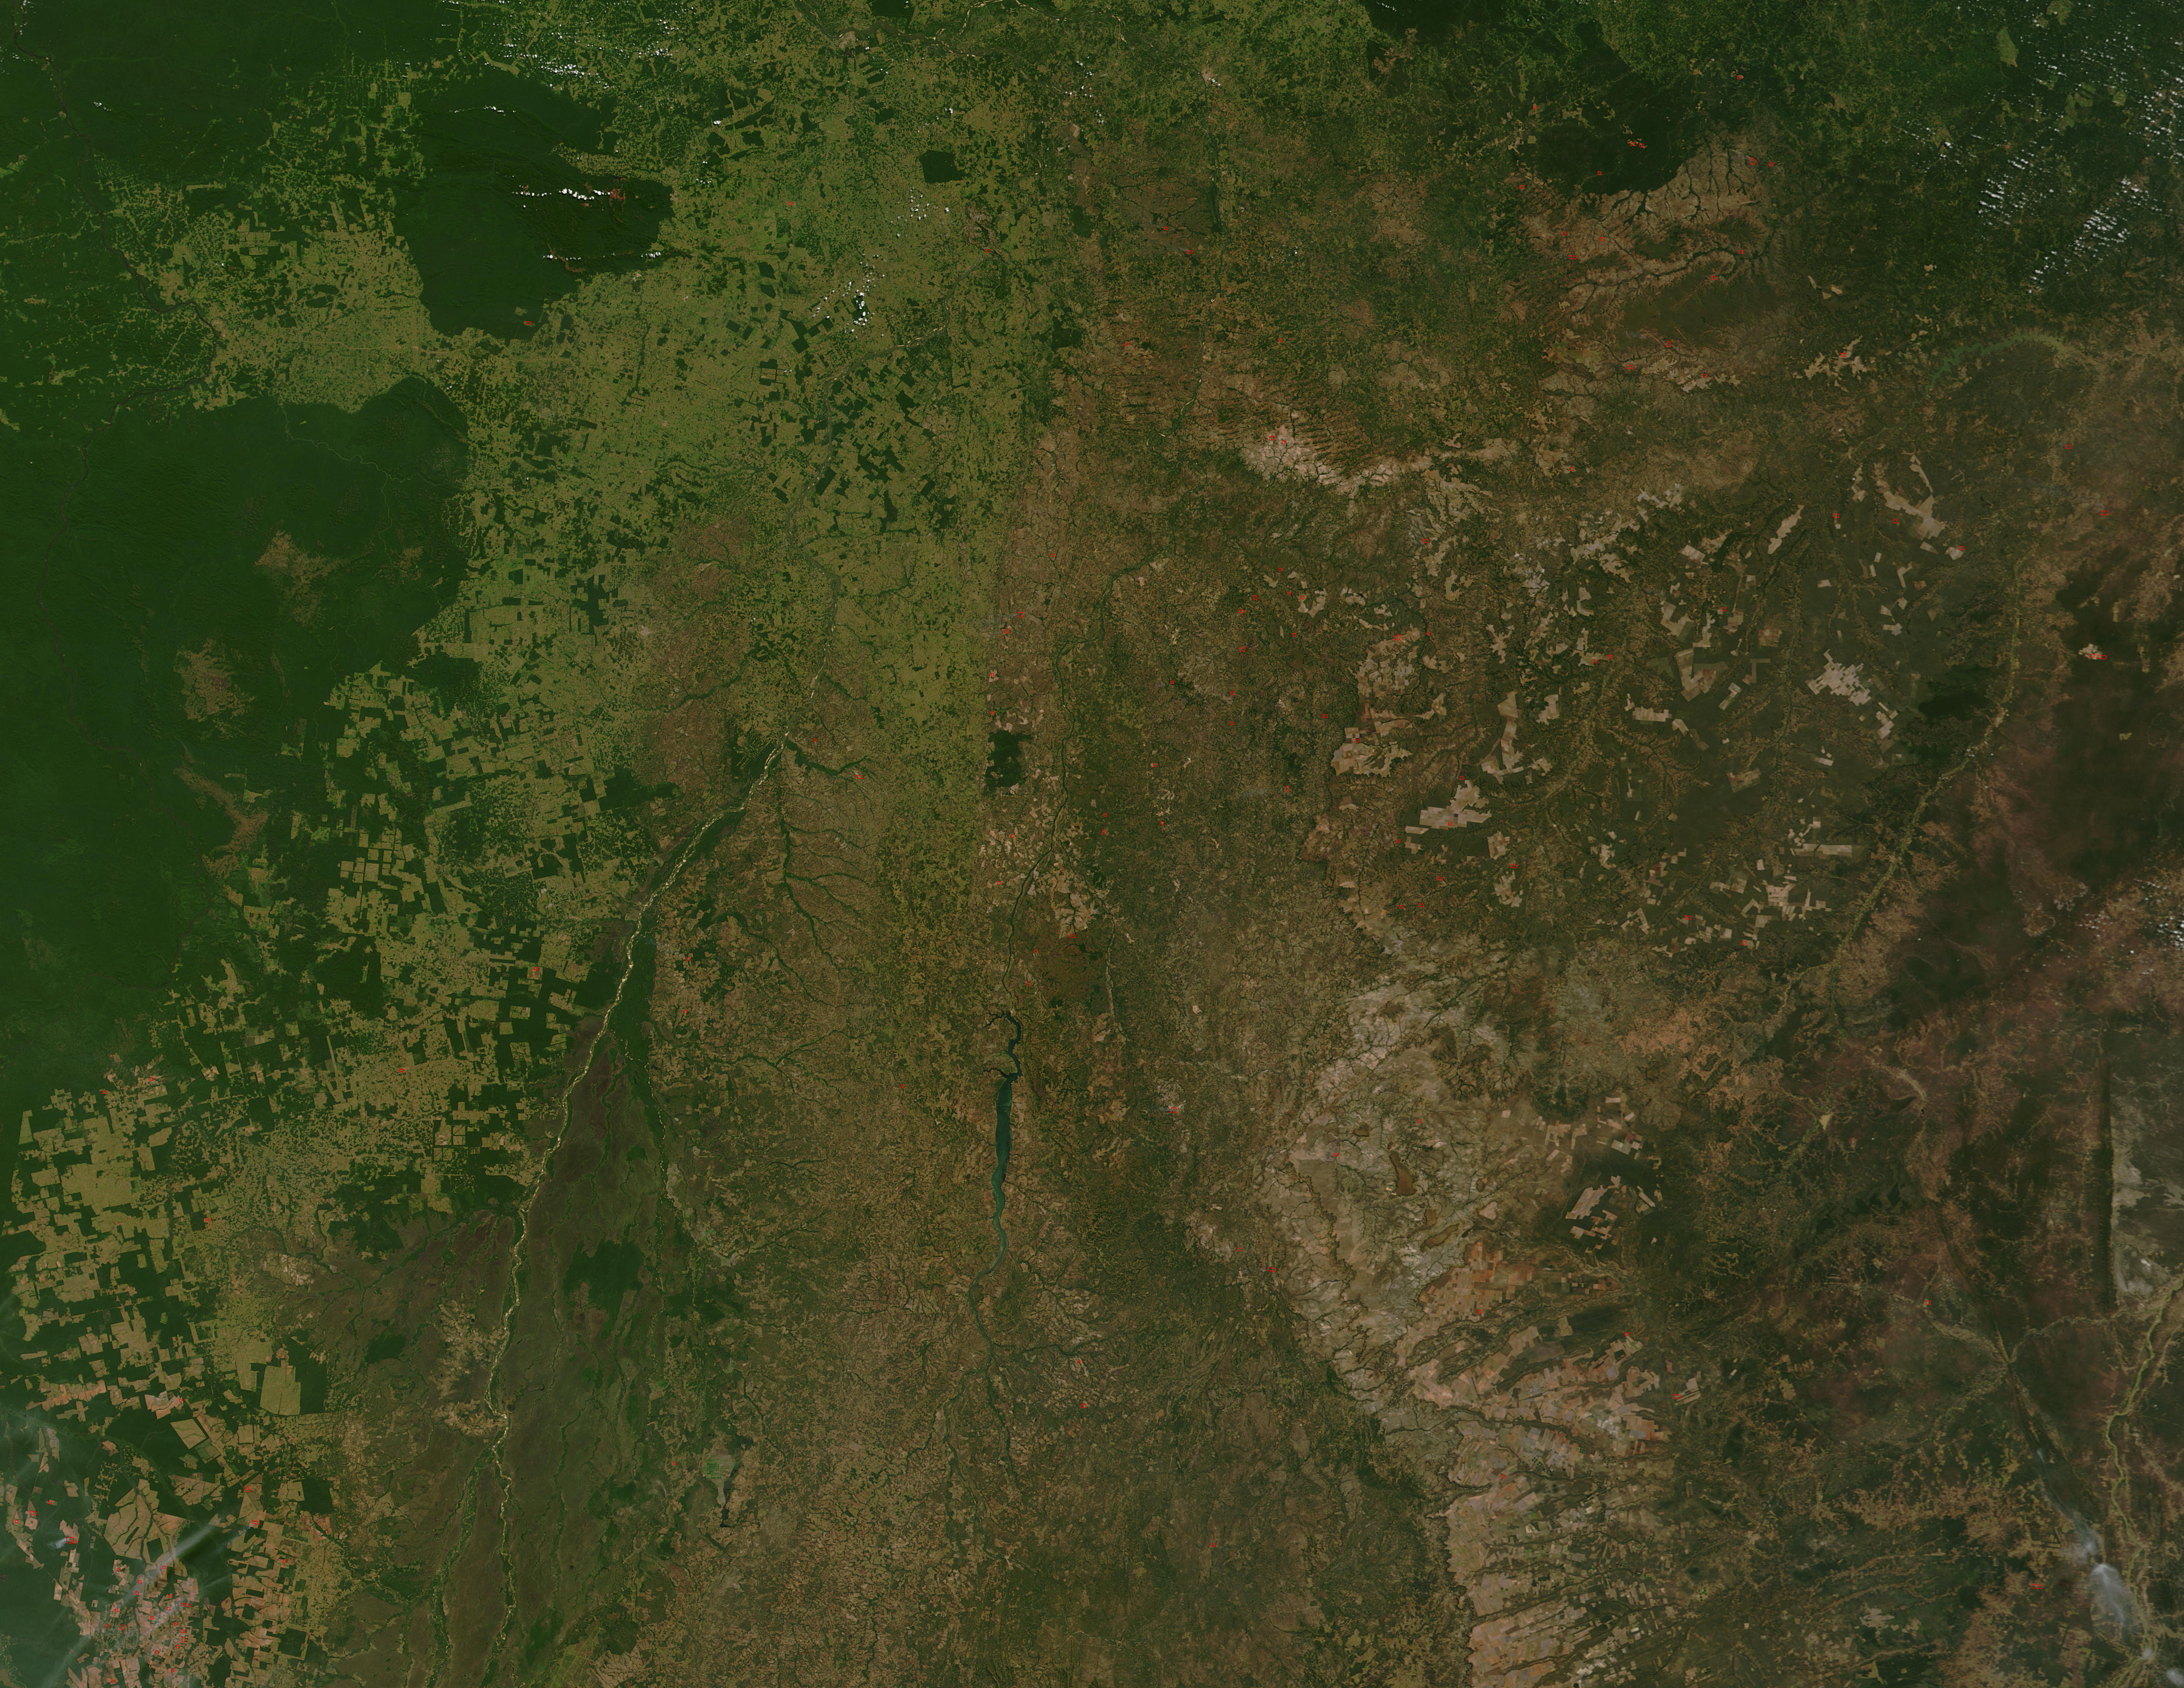 Cerrado savannas of eastern Brazil